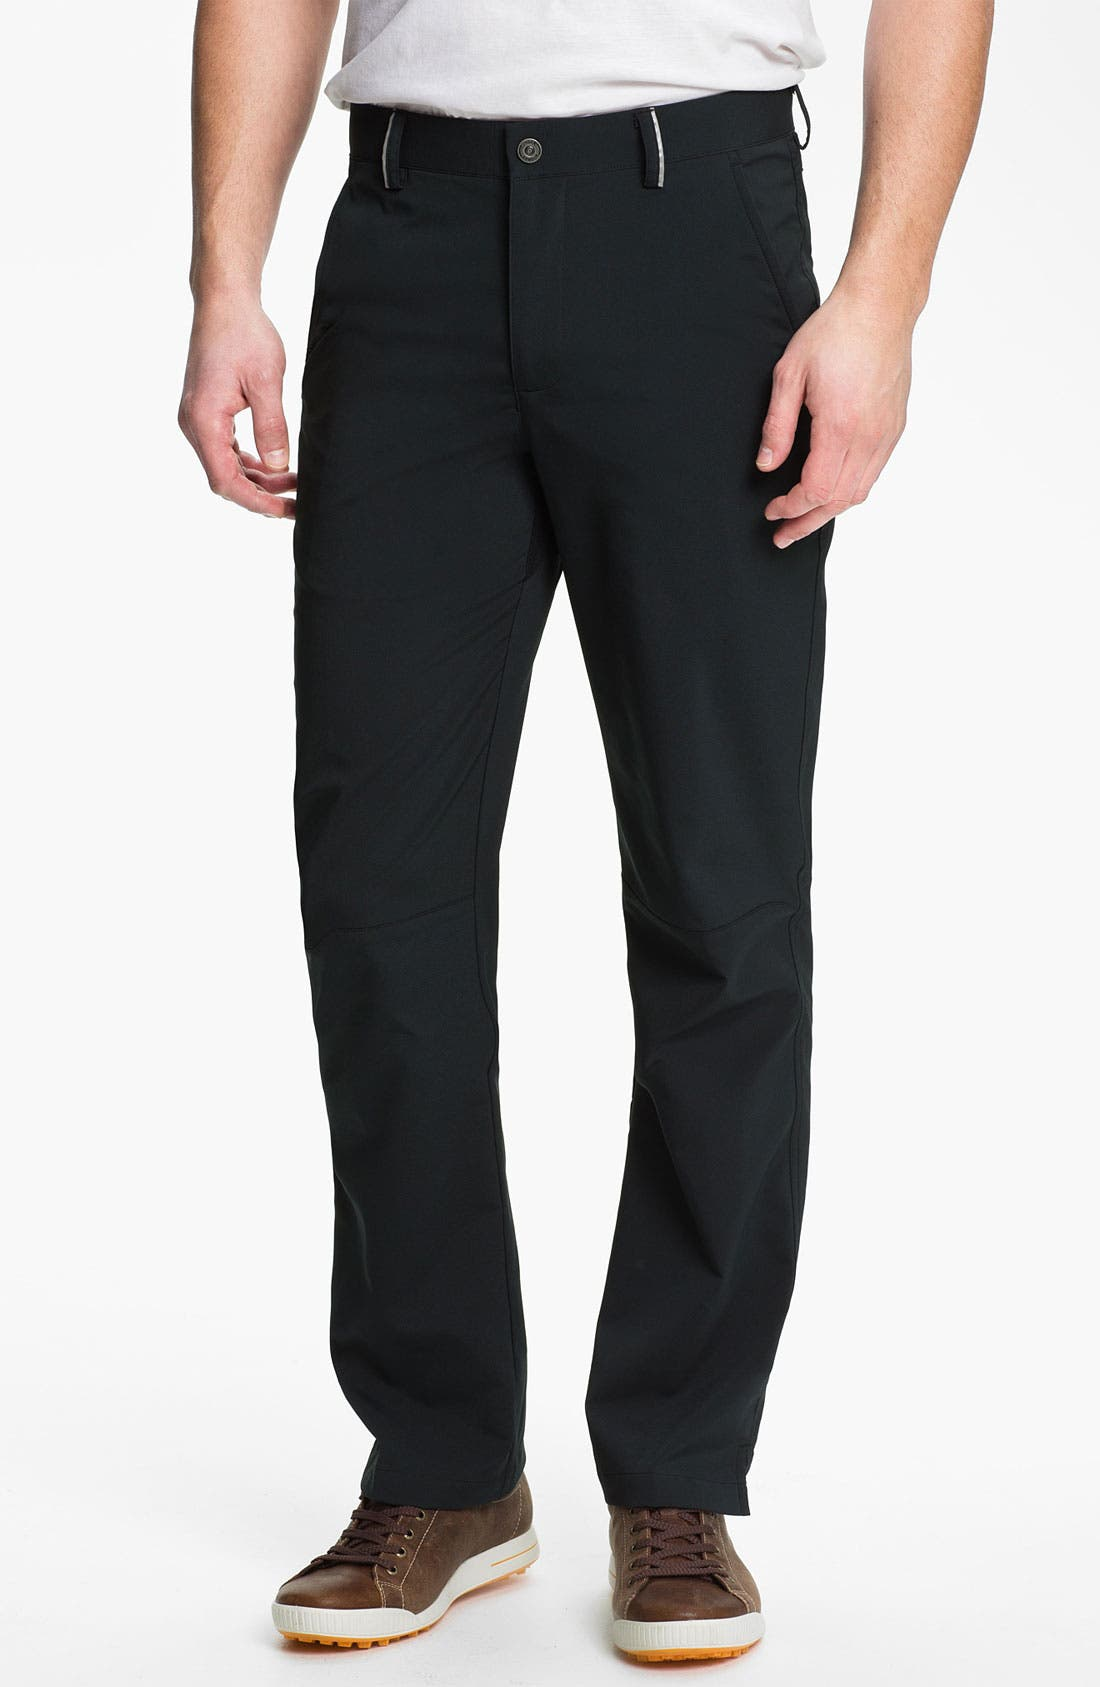 Main Image - Under Armour Coldblack® Golf Pants